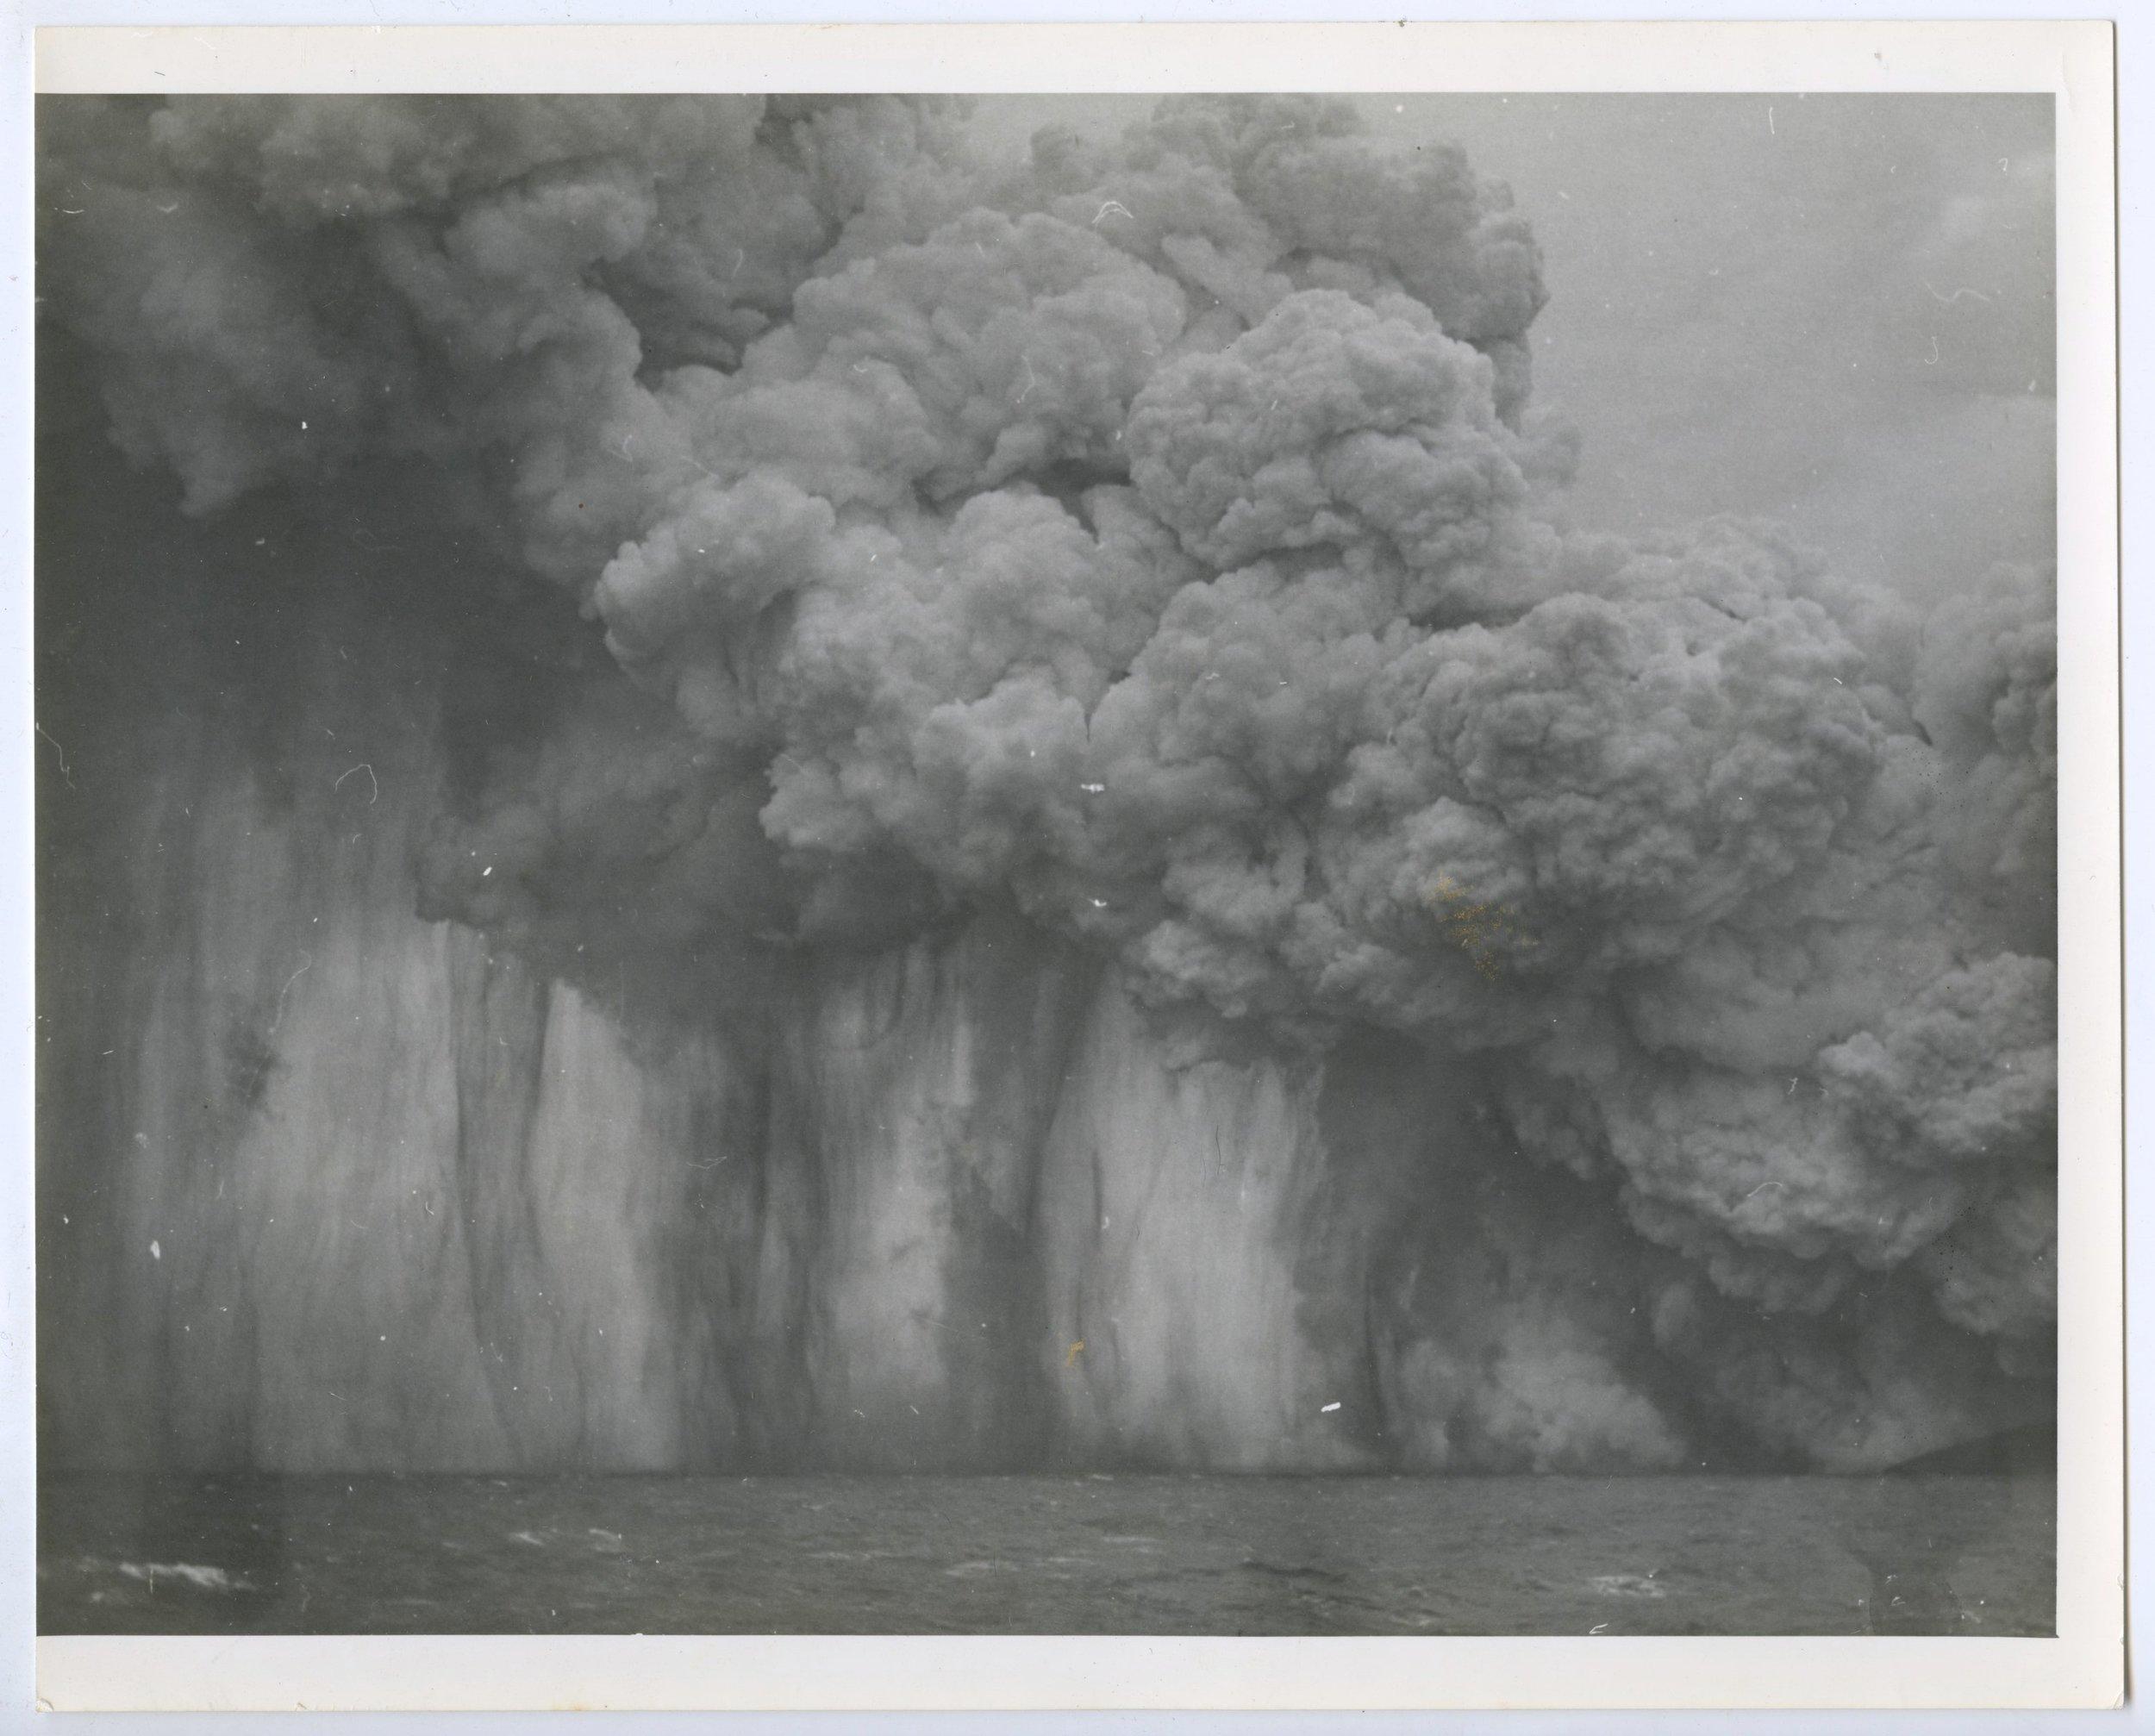 stursay eruption photog swimming chp 8 subaqueous  7.jpeg